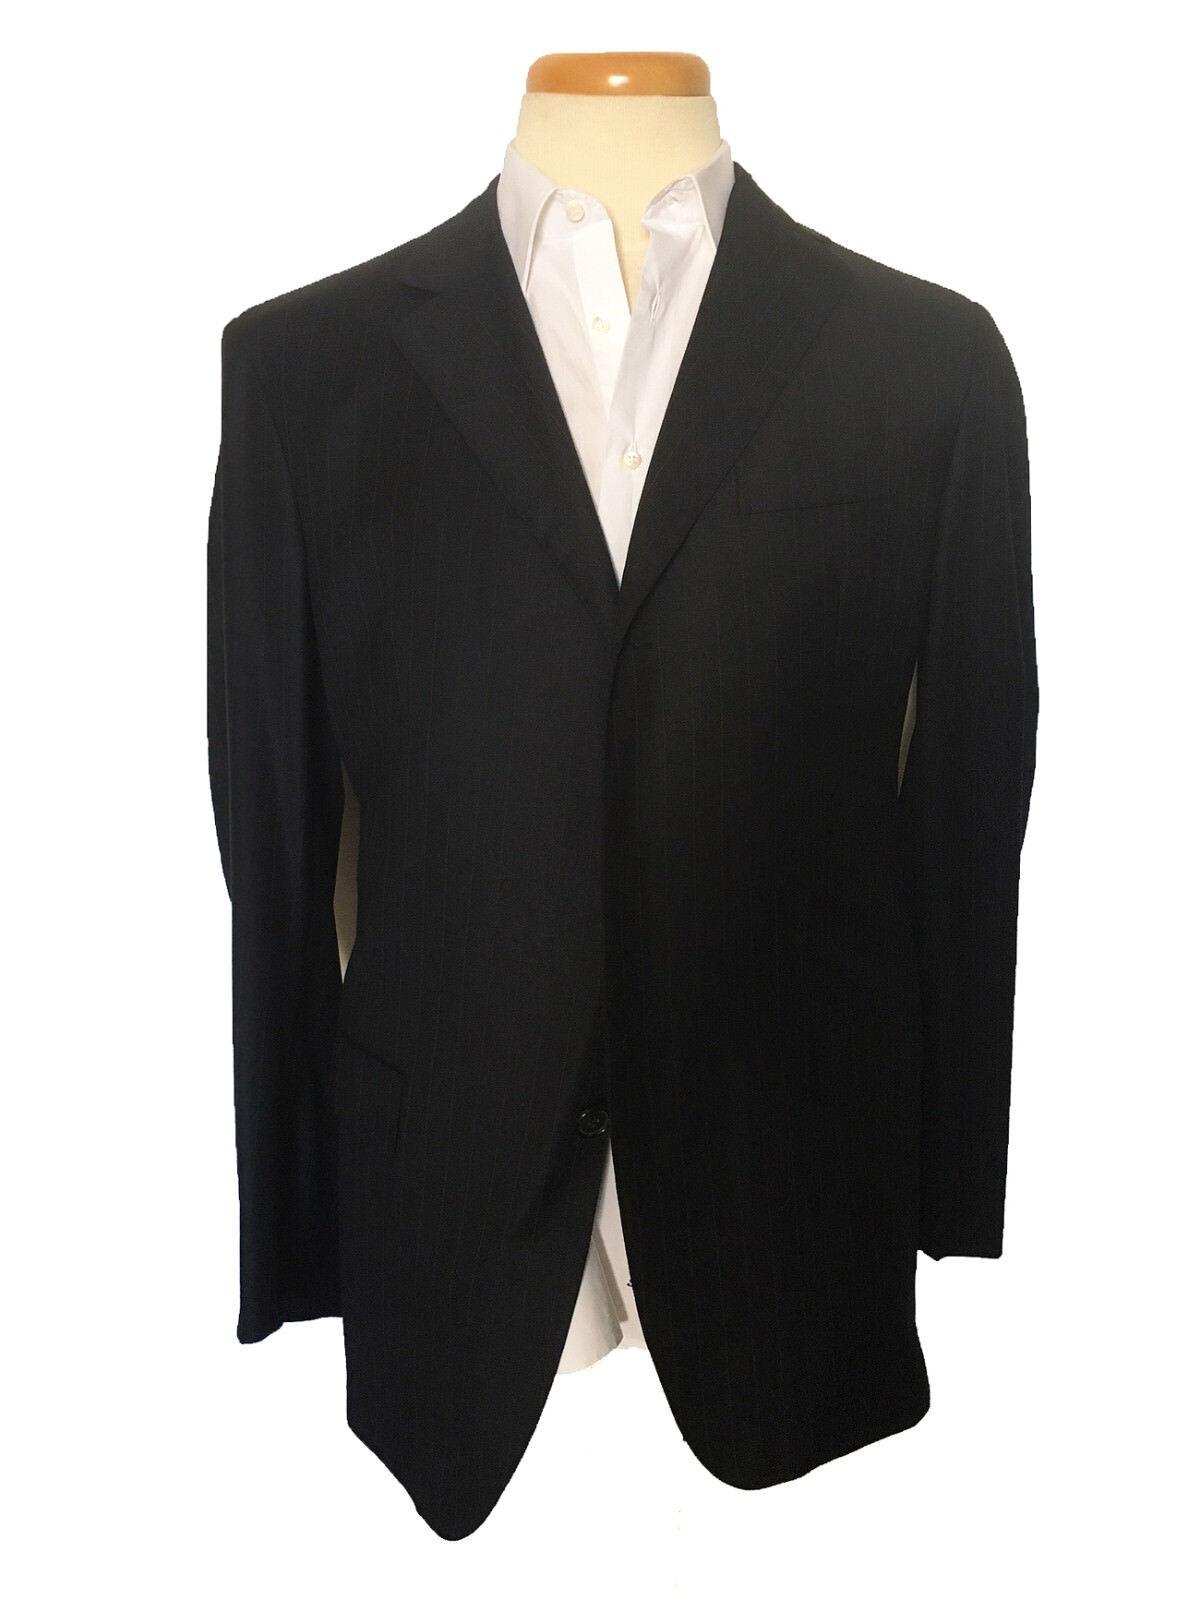 GIANFRANCO FERRE Dark Dark bluee Men Suit Size US 44 IT 54 Drop 8